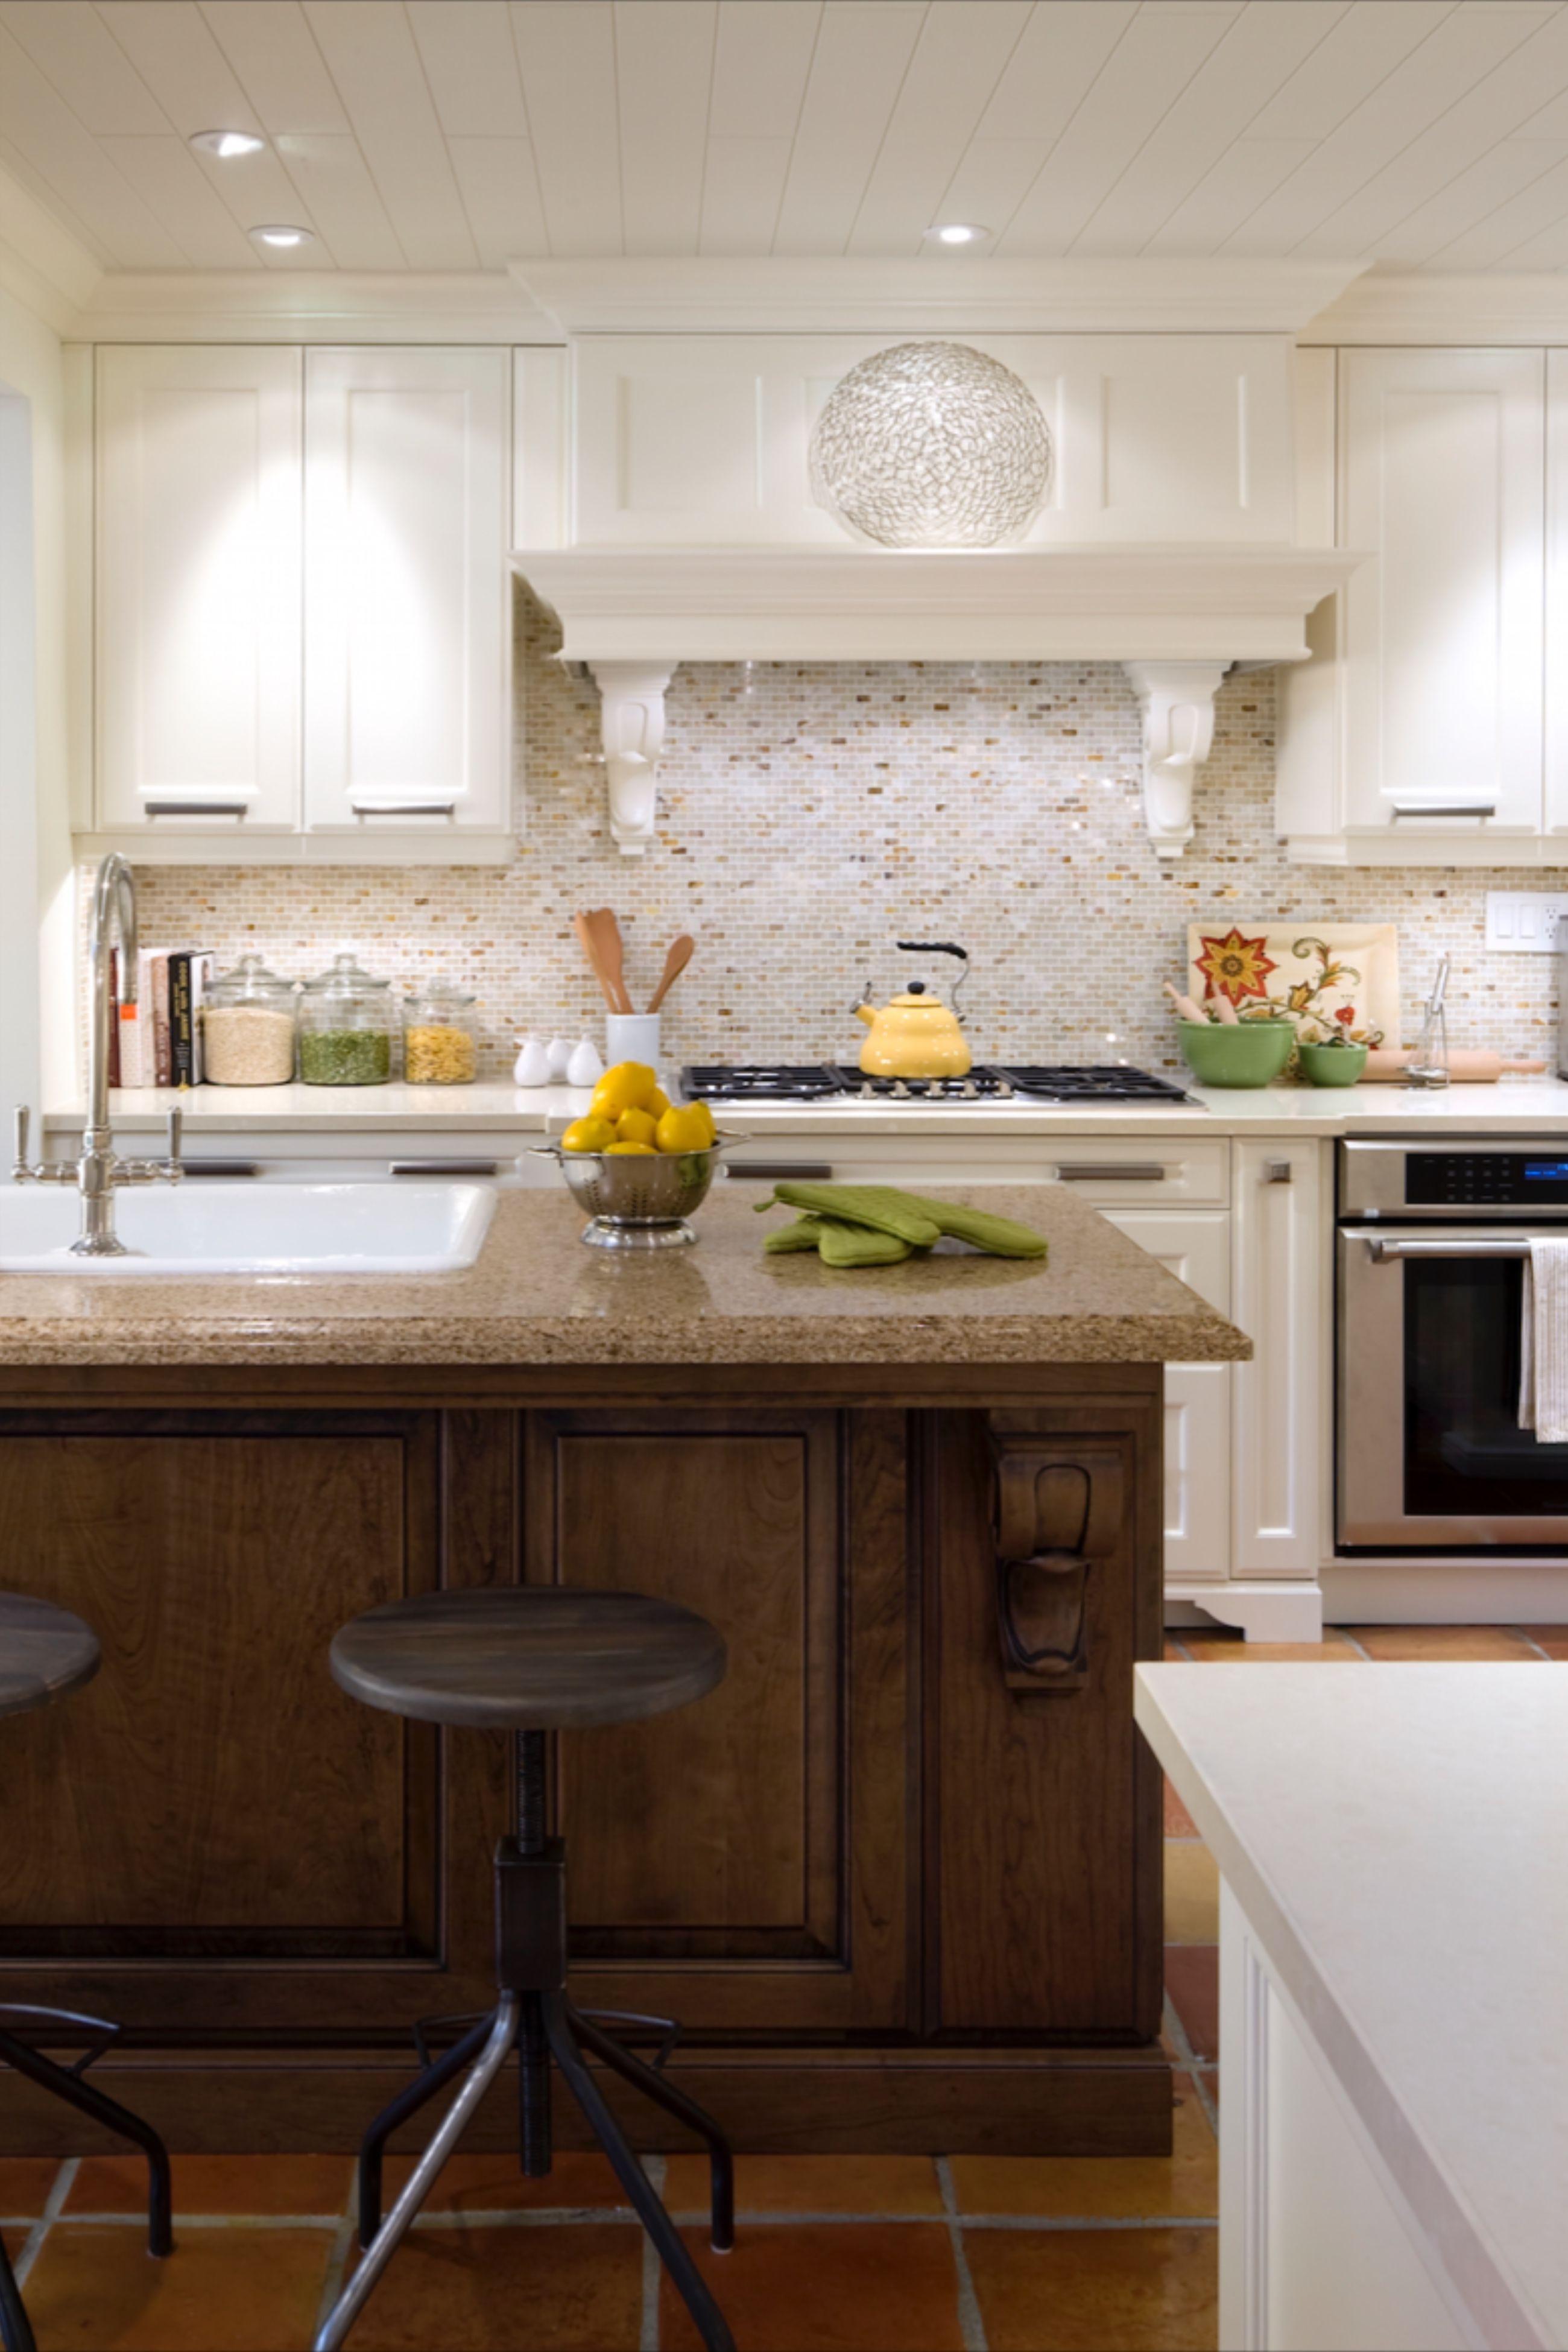 The Kitchen Backsplash Is Like Jewelry